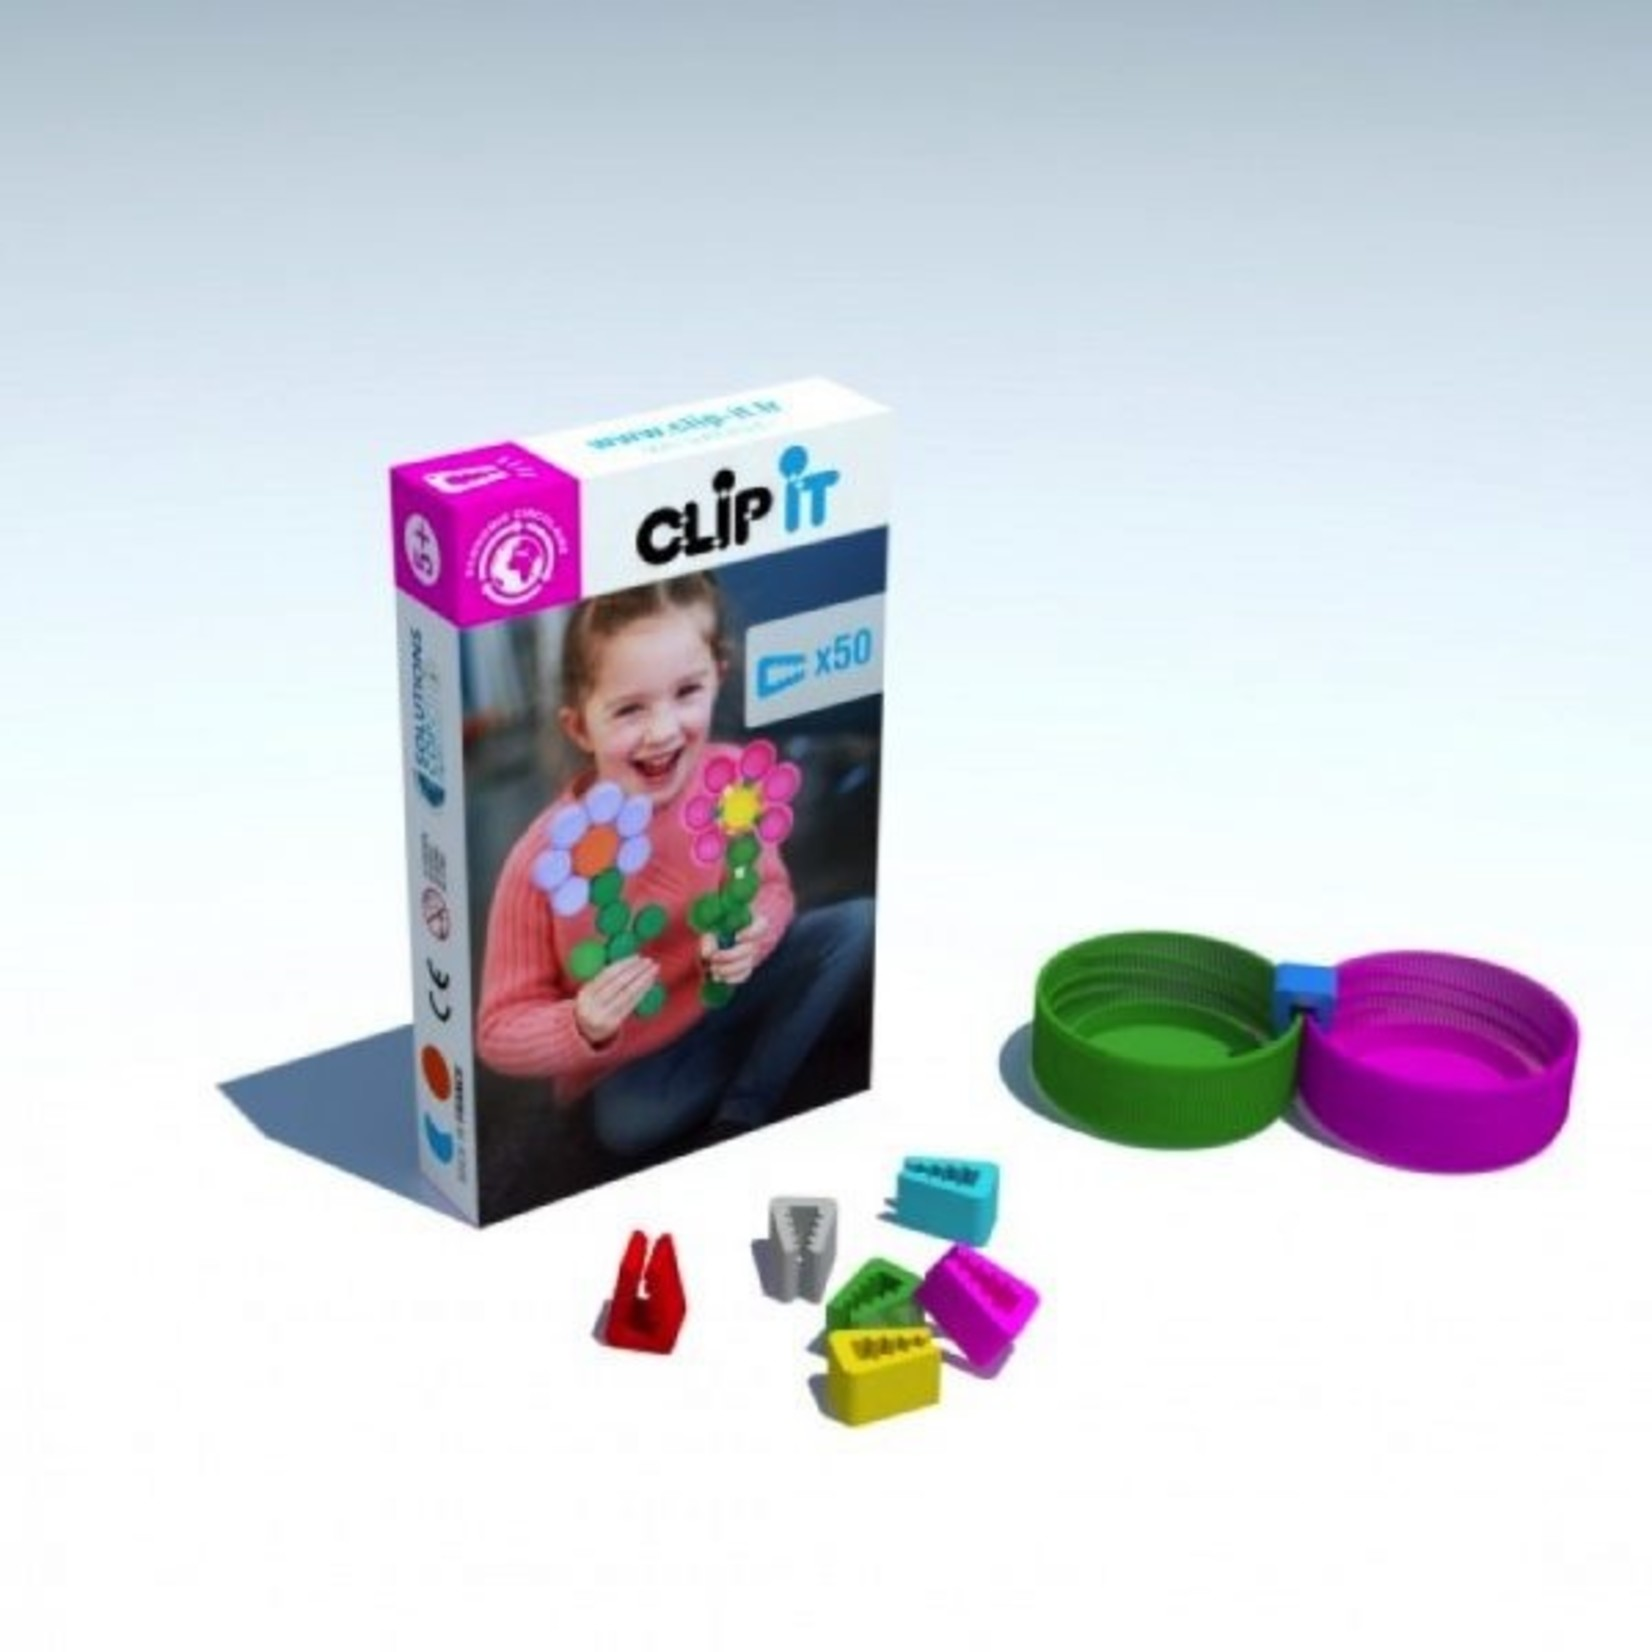 Clip-it 50 clips - bloem